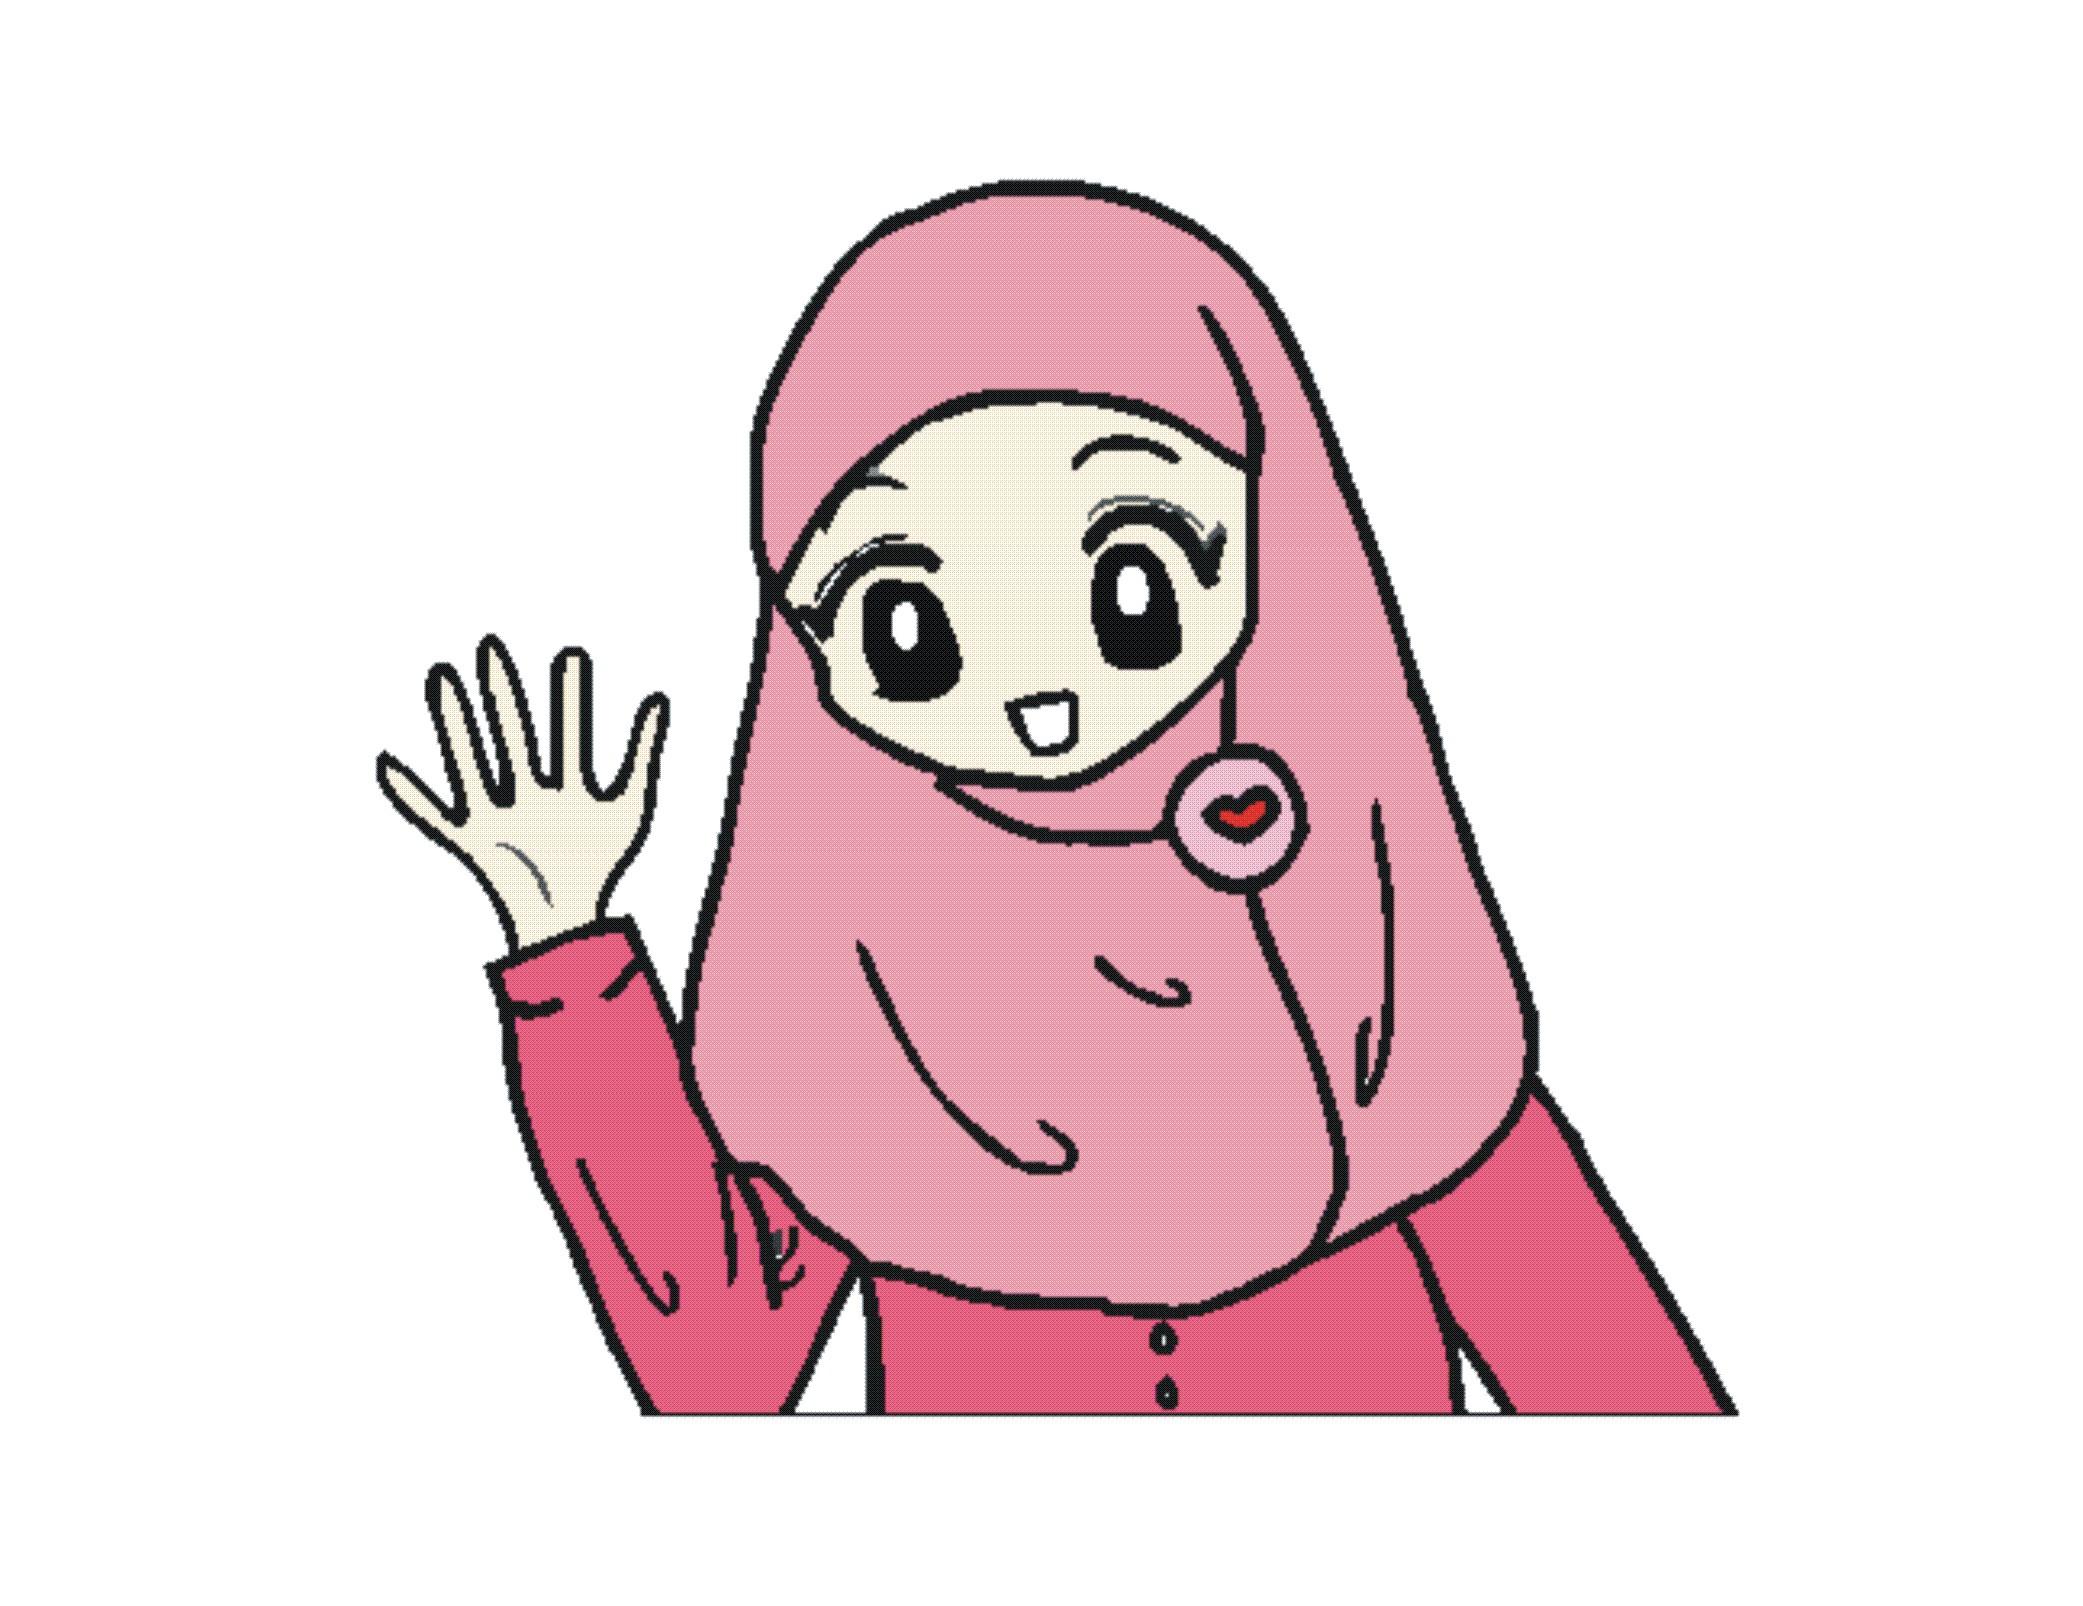 Akhwat Pink5jpg